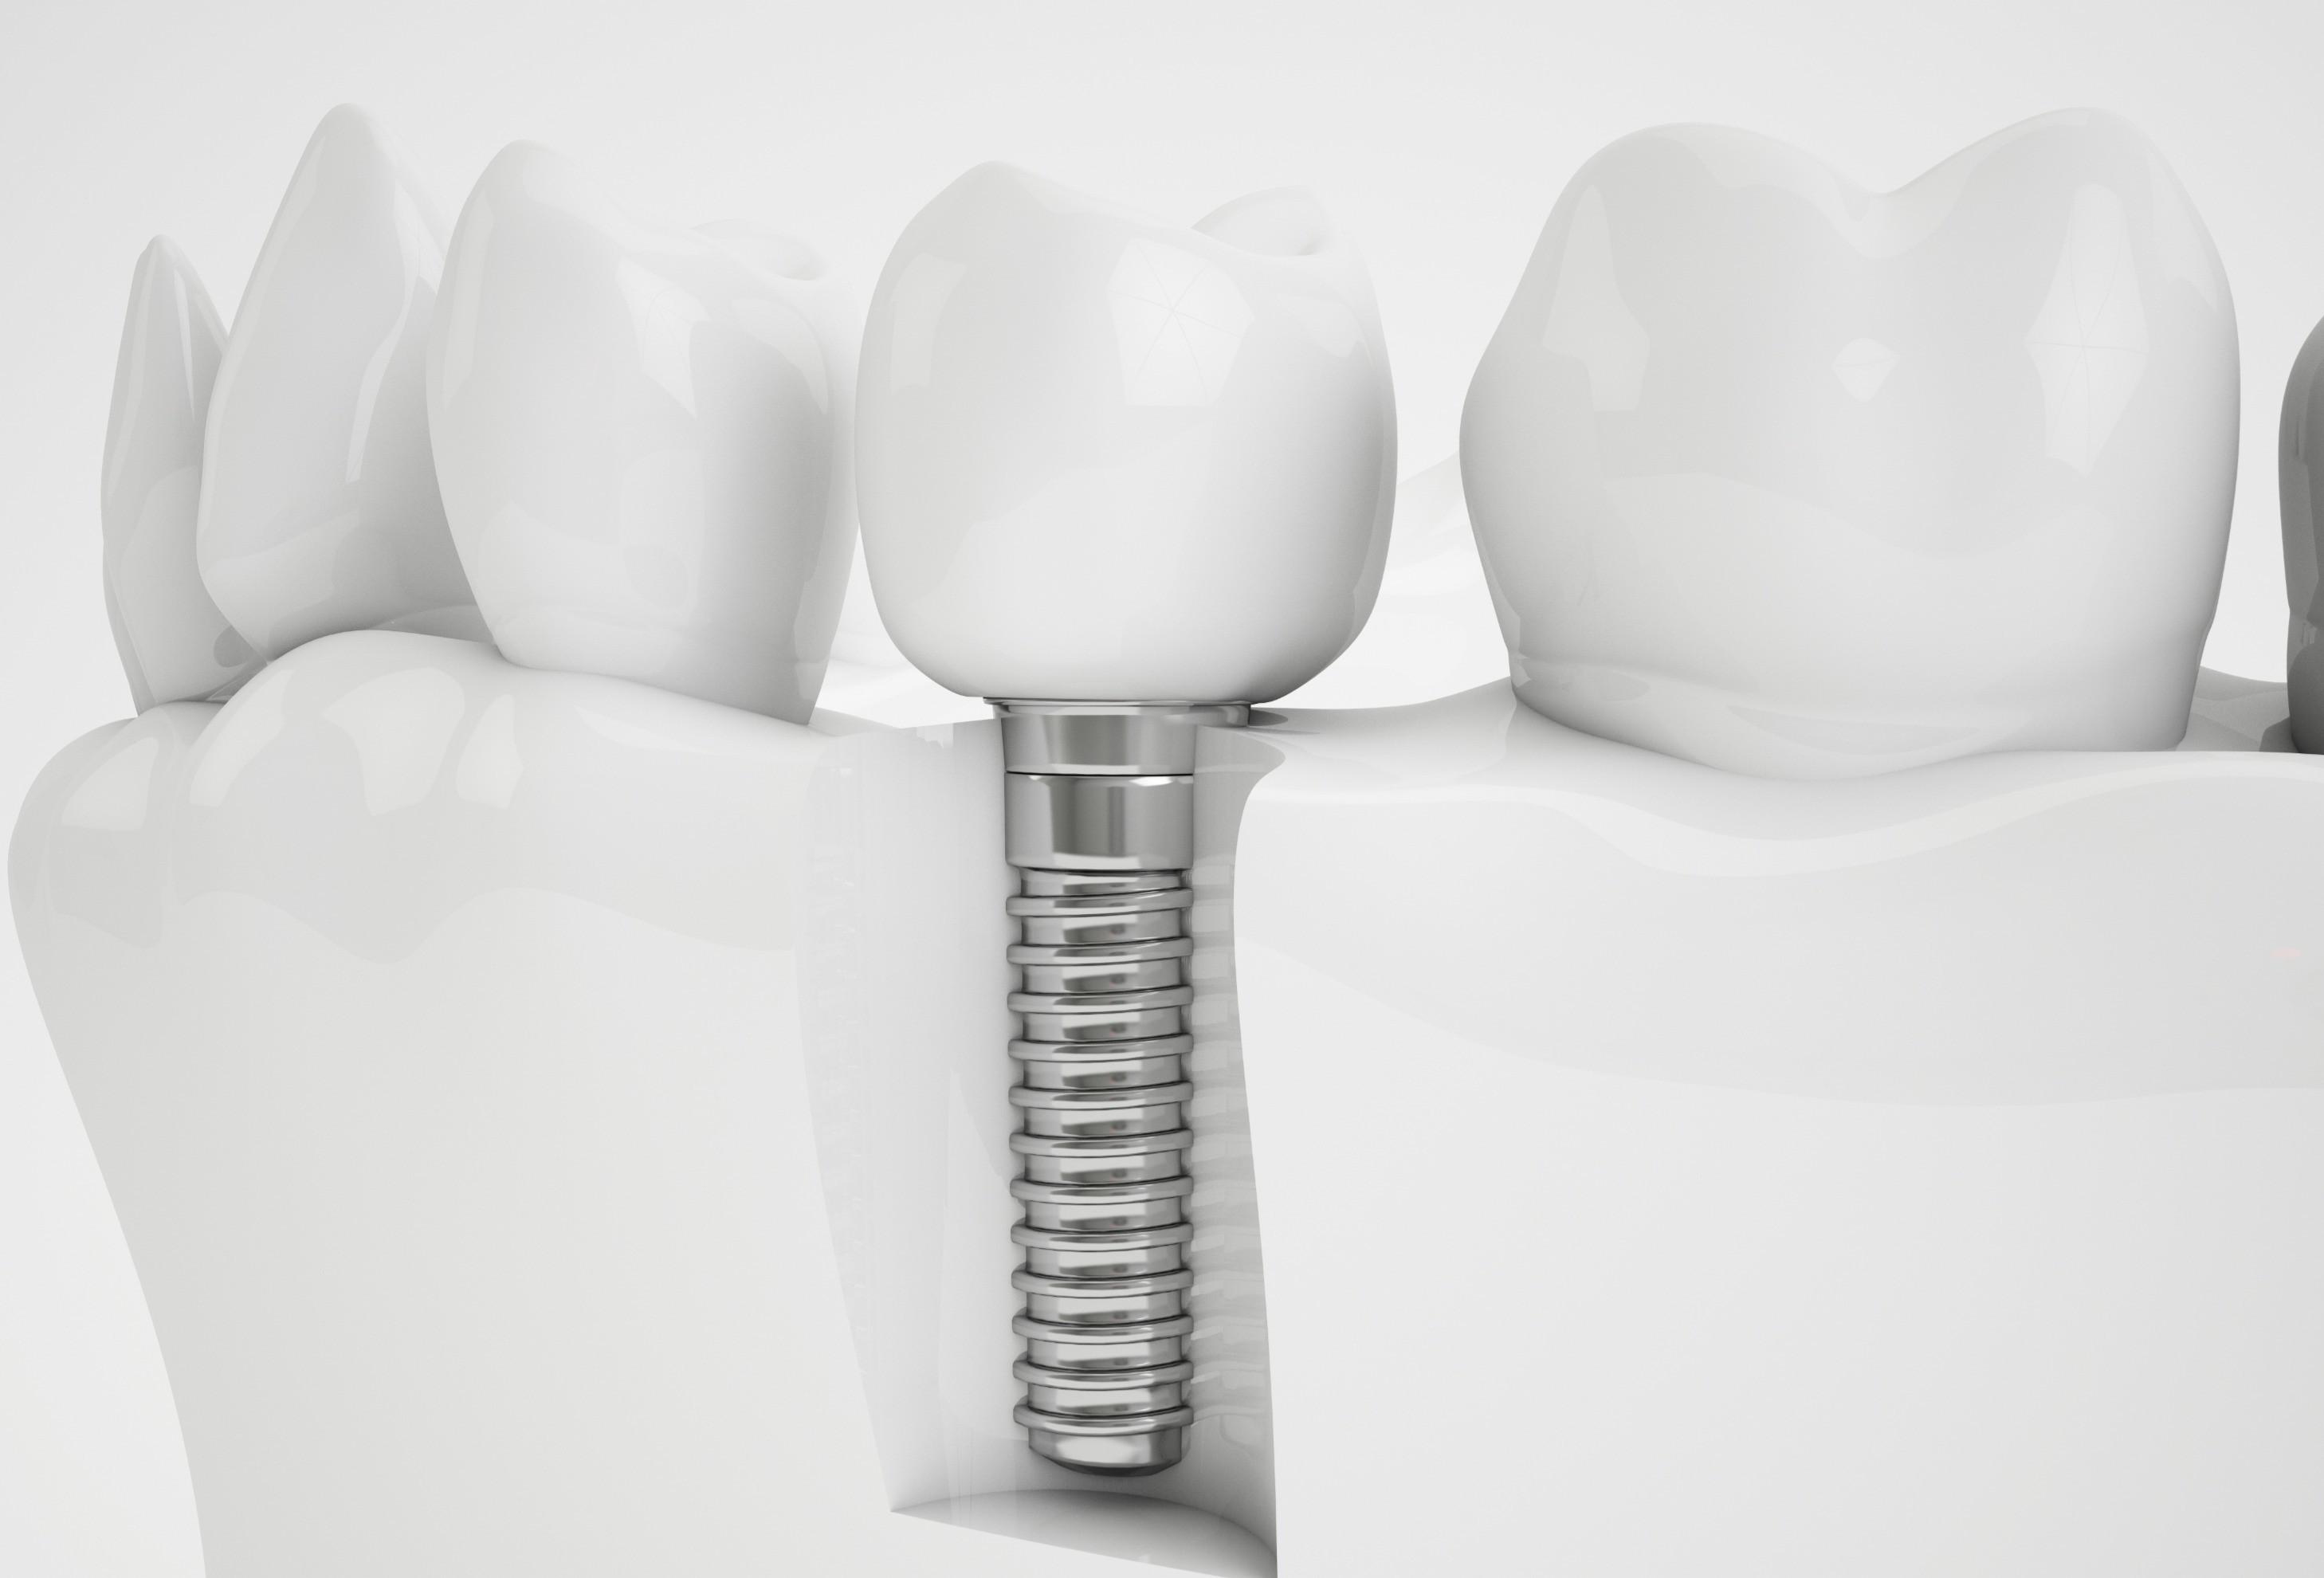 Free consultation on implants